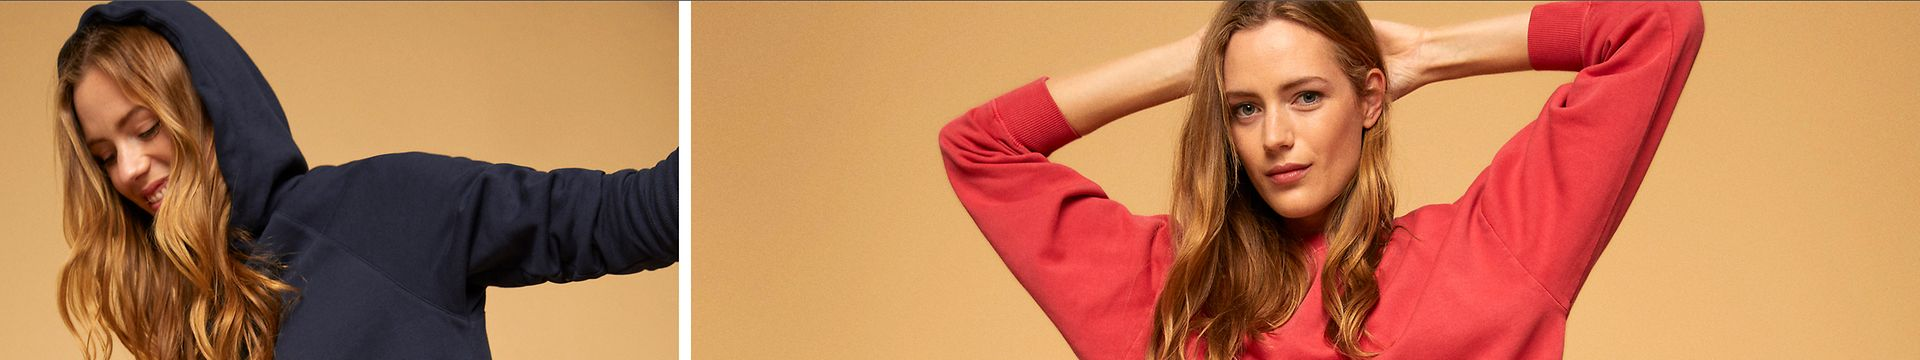 342020 - Women - tc banner - sweat capsule - IMG